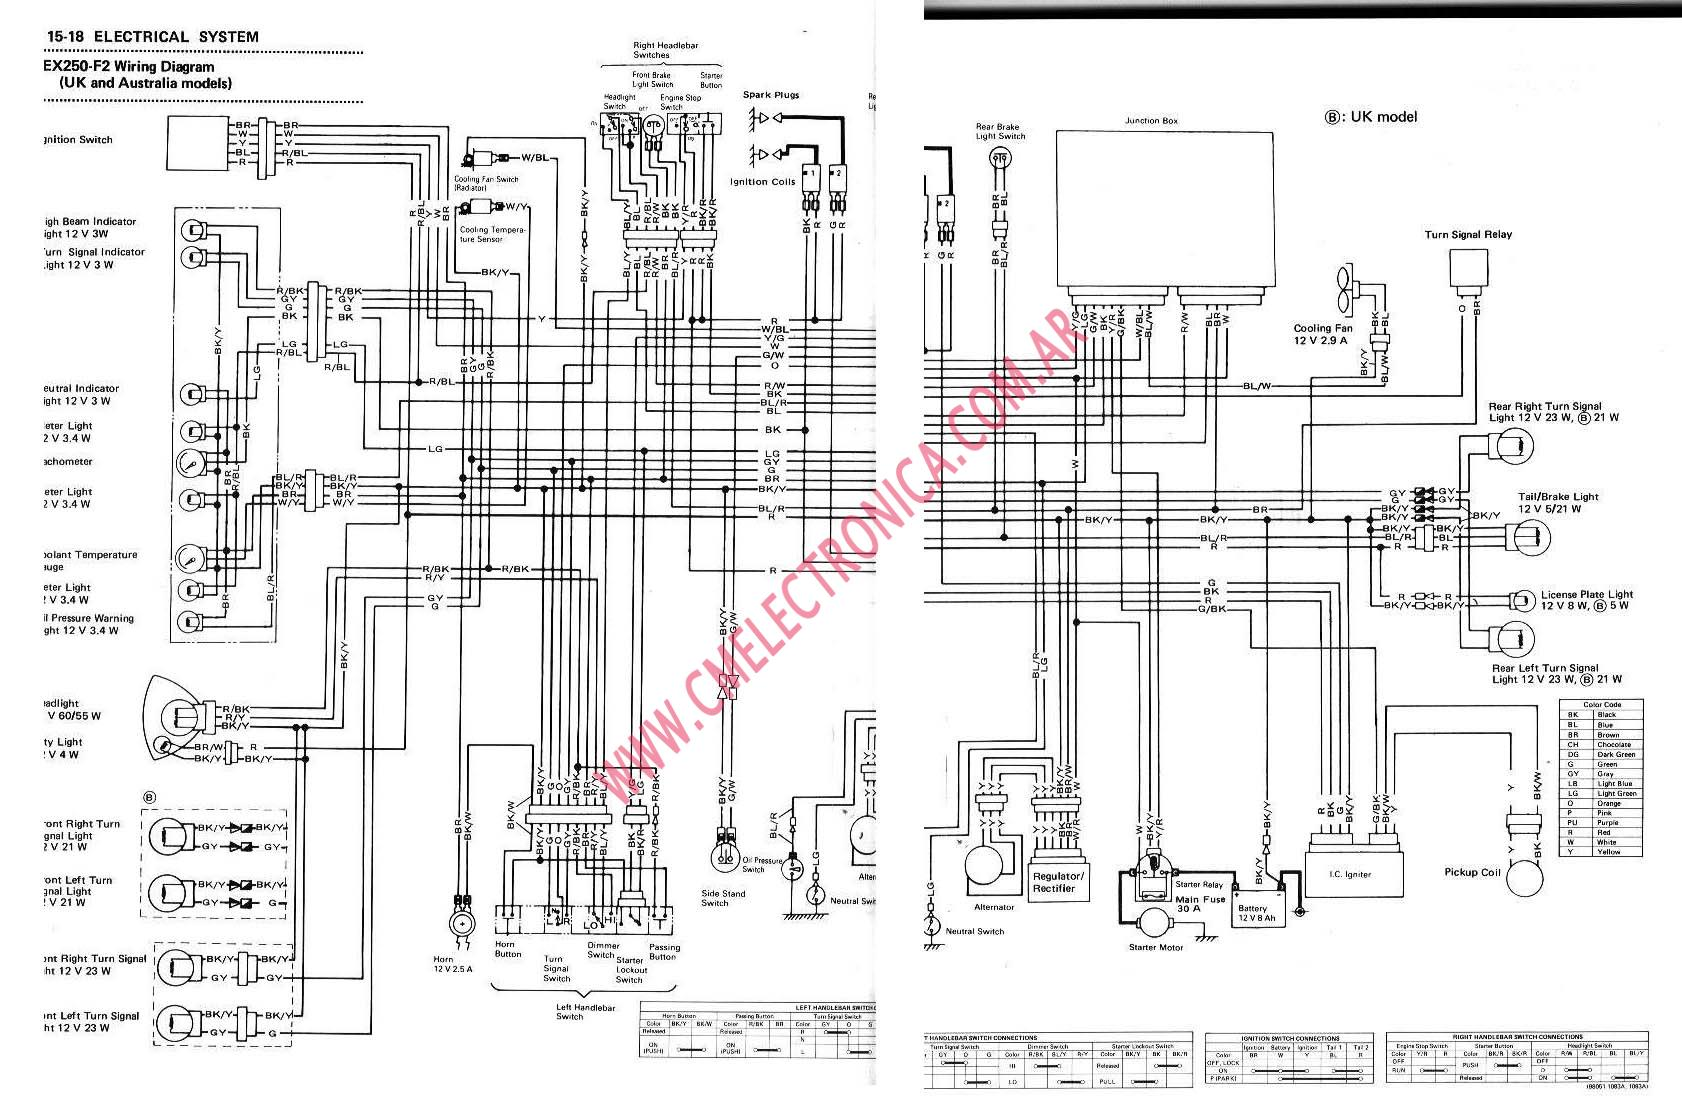 zx12 wiring diagram netflix wiring diagram boyer with wiring Kz1300 Wiring Diagram  ZX12 Scooter Kawasaki ZX12 R 2003 ZX12 Mirrors